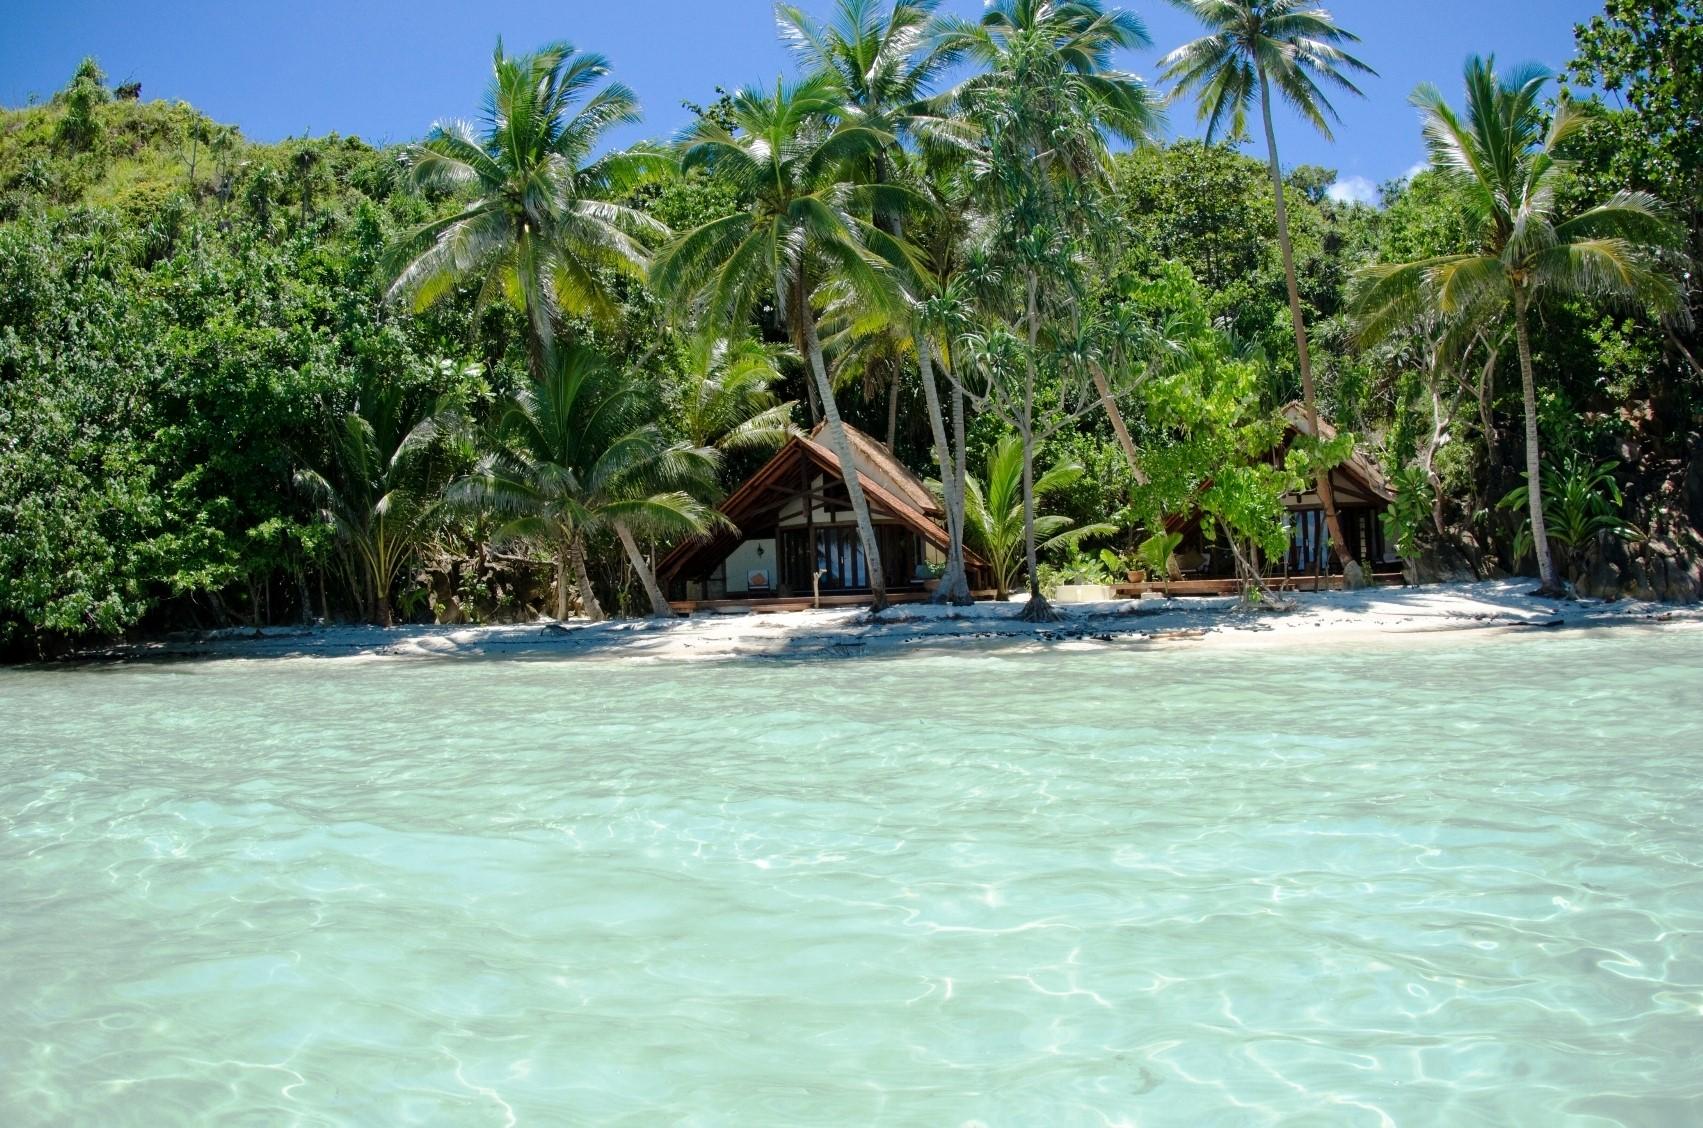 Stay In Misool Eco Resort Raja Ampat Islands